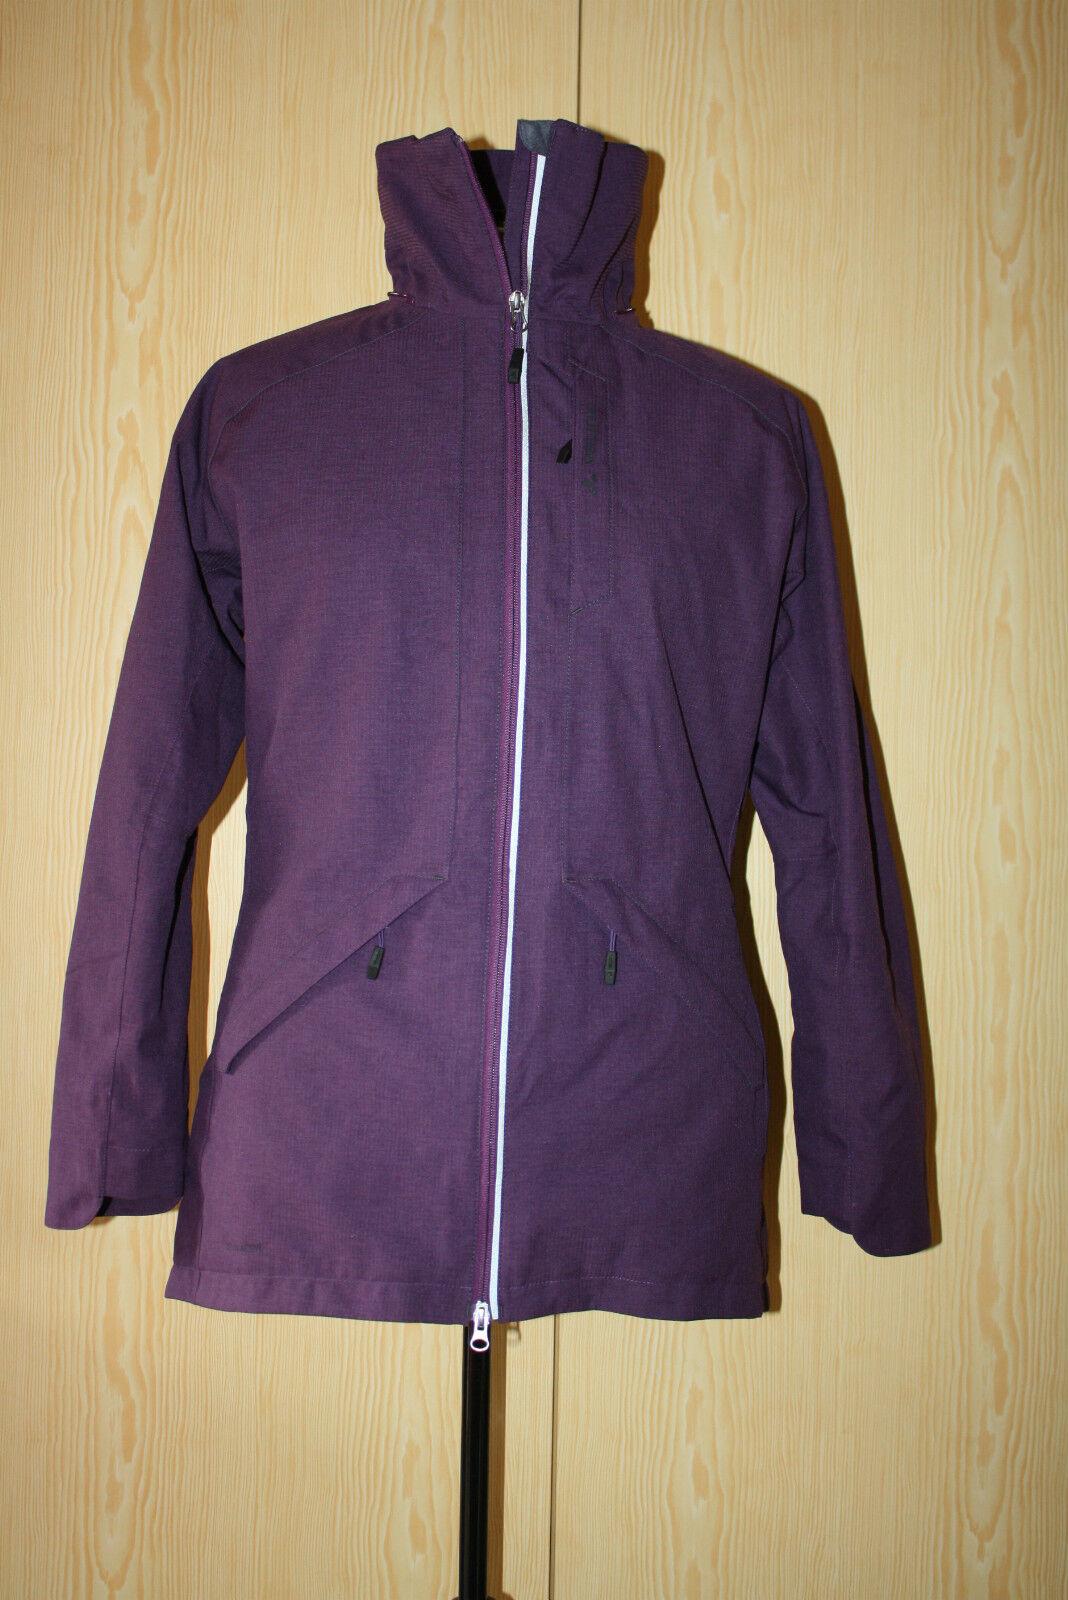 VAUDE Damen Jacke damen Homy Padded Jacket, Amethyst, 44, XL, 04816,  180 EU